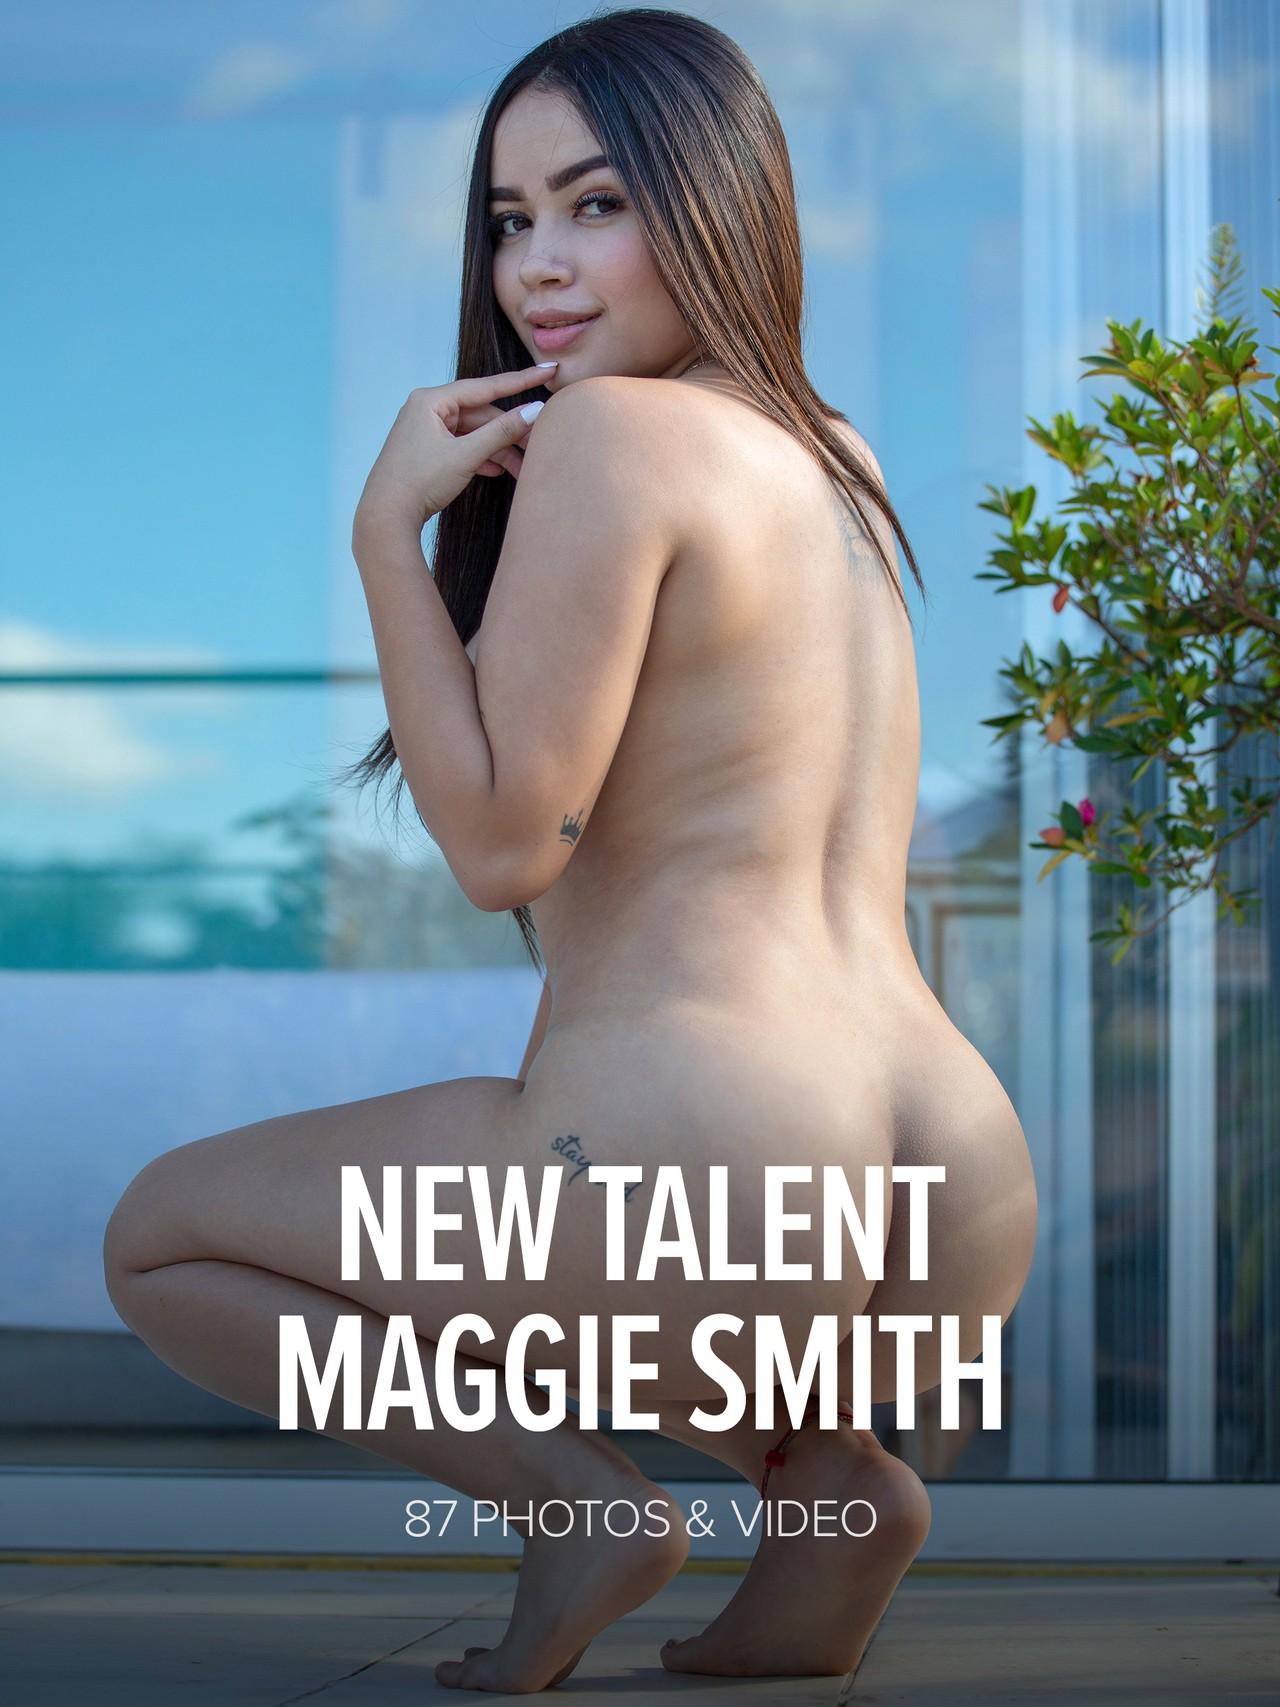 Maggie Smith: New Talent Maggie Smith